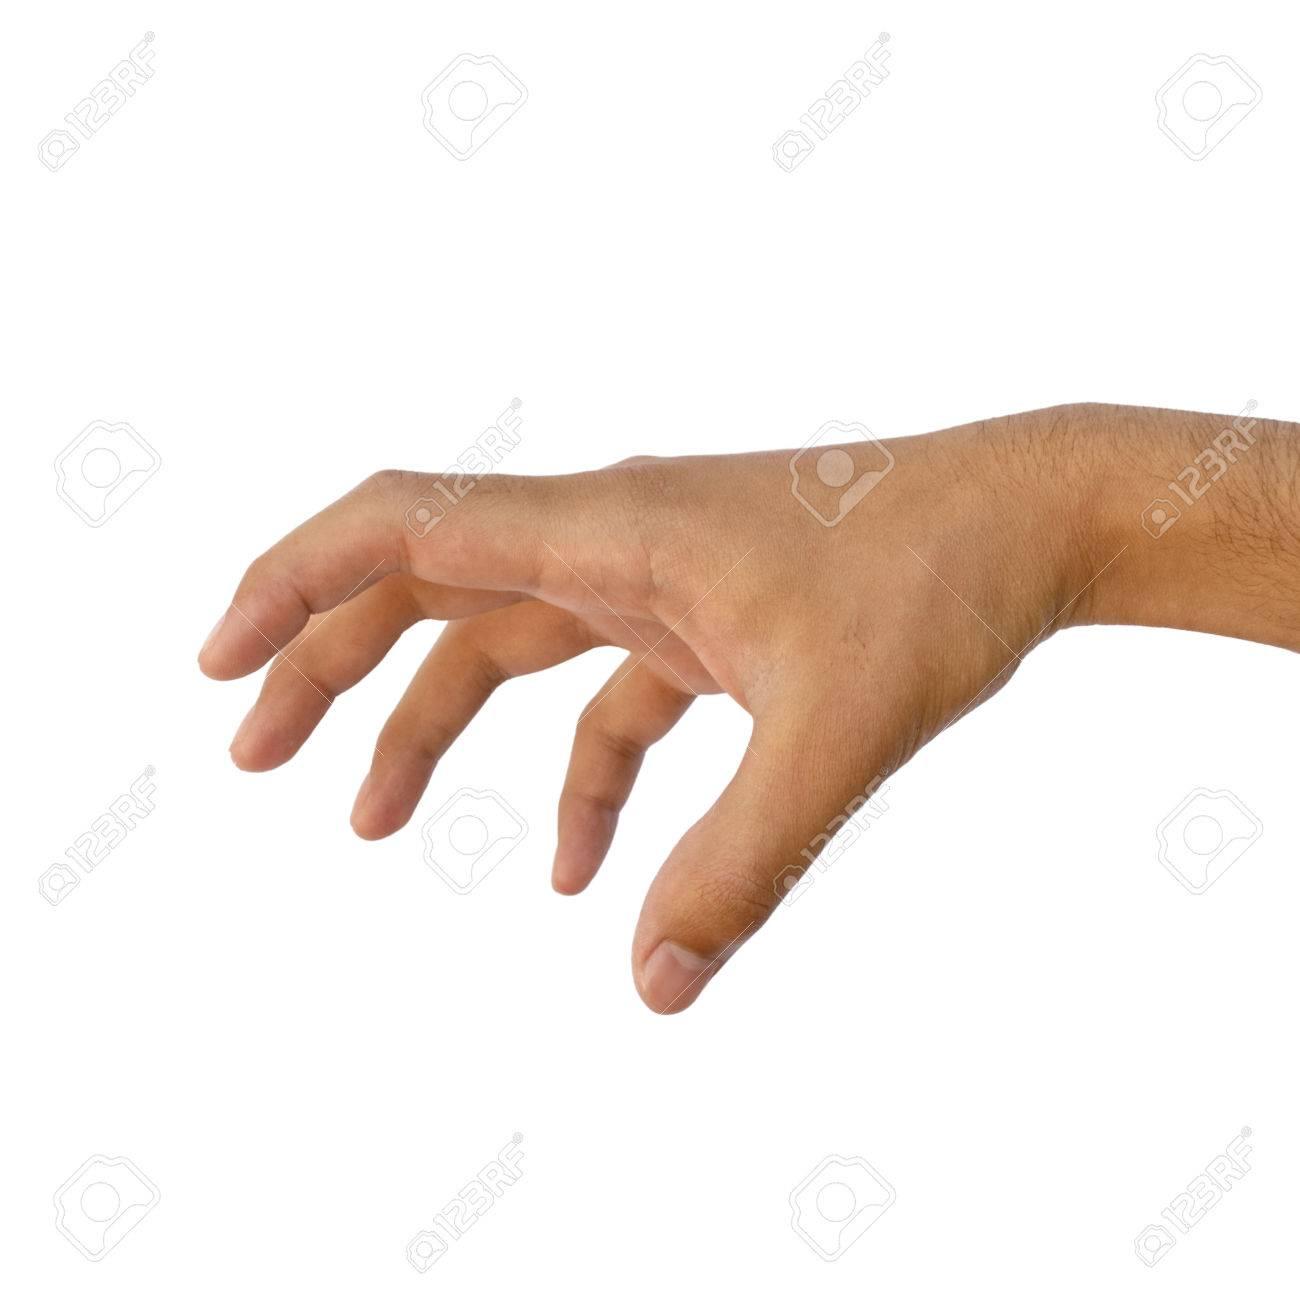 37172813-male-hand-grabbing-pose[1].jpg